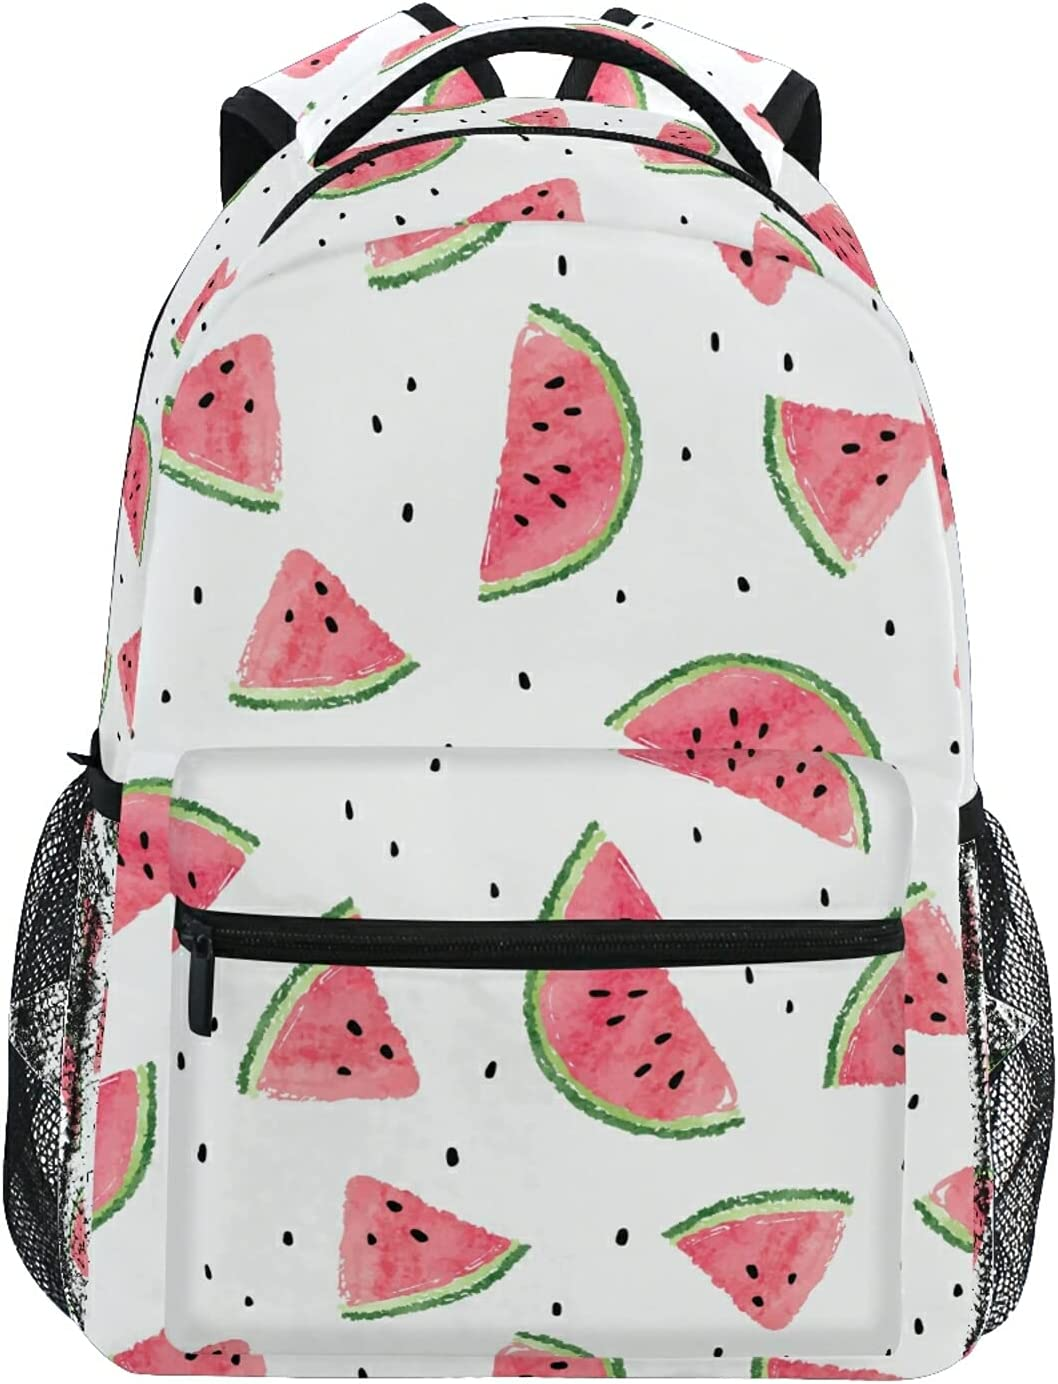 UWLIFE Fruit Watermelon Polka 2021 new Dot School Boy K Selling Backpack for Girl